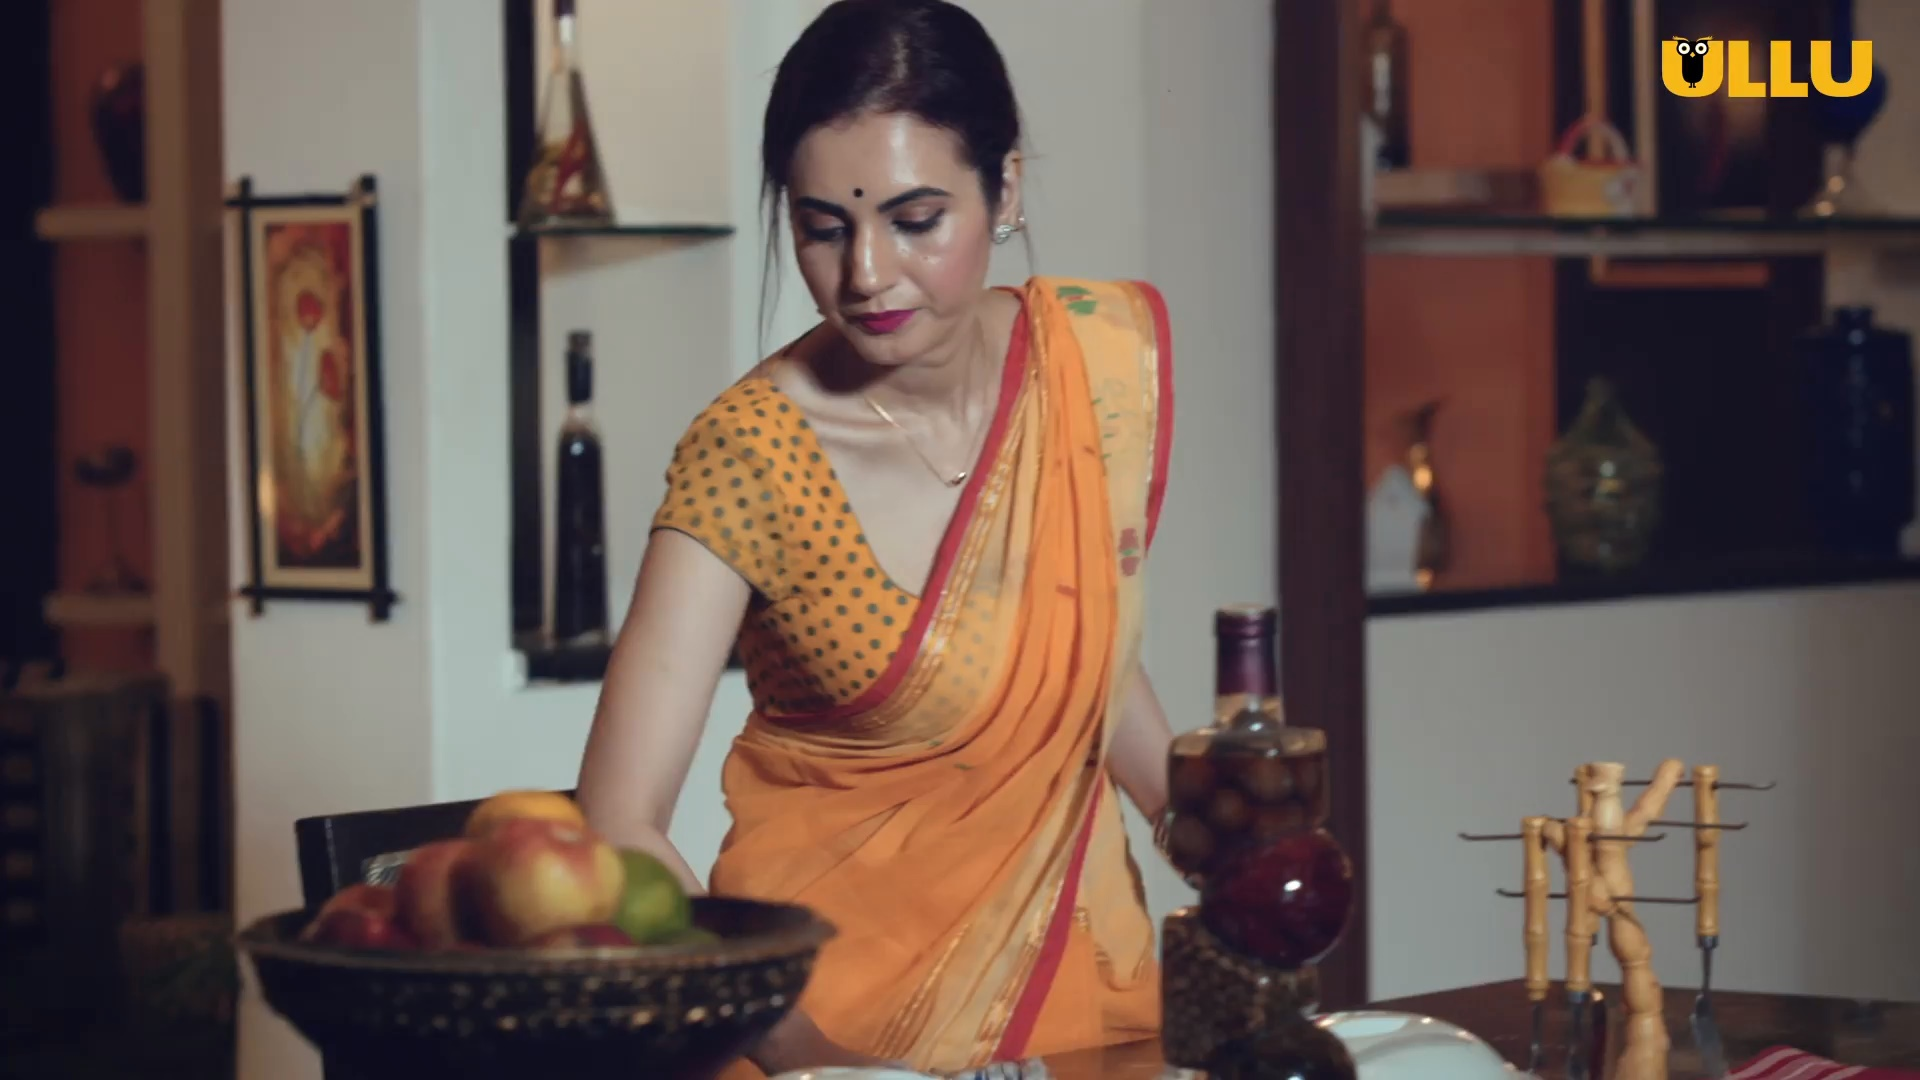 prabha ki diary the wife ullu